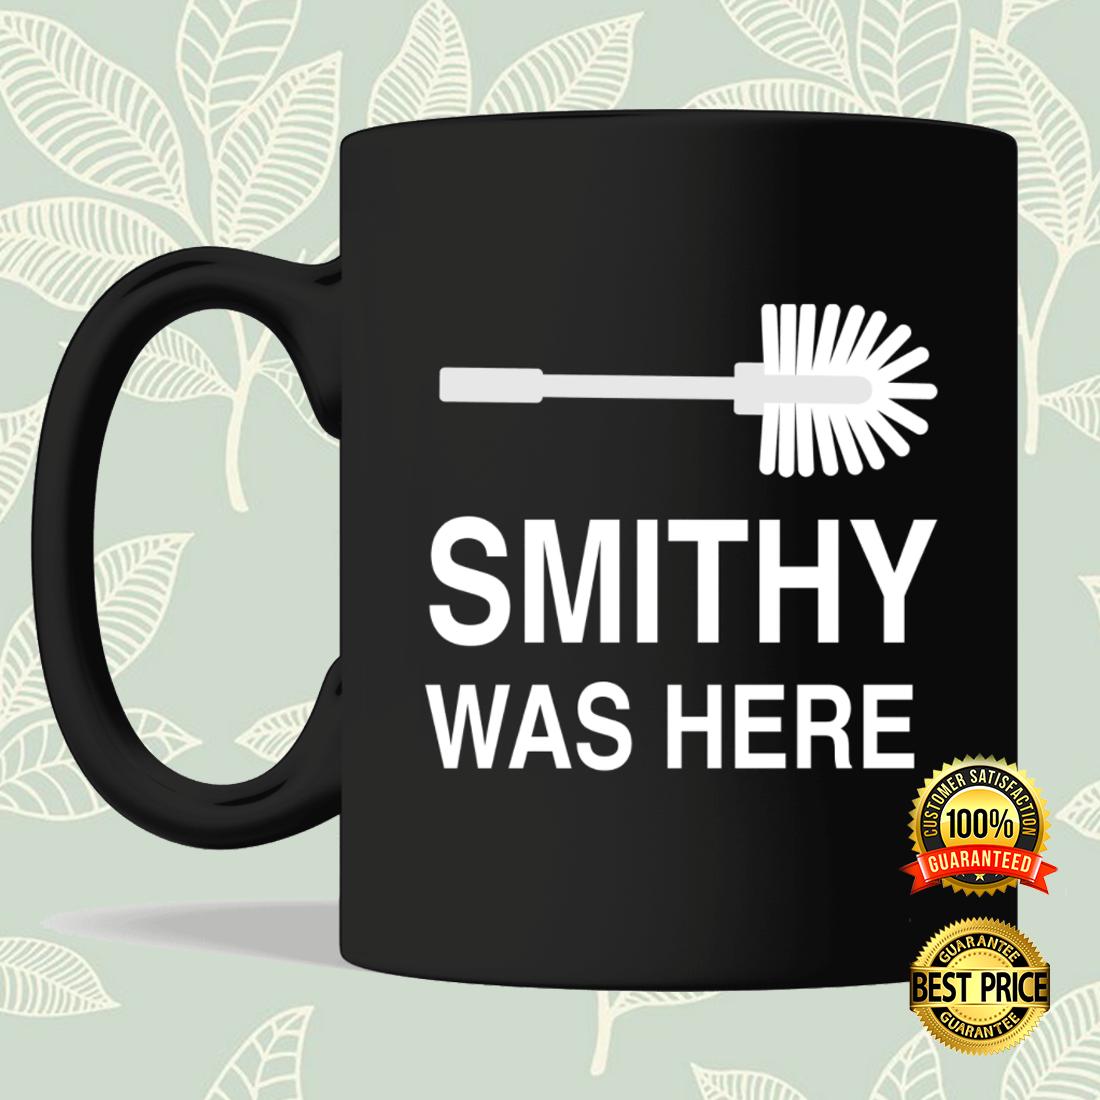 SMITHY WAS HERE MUG 5